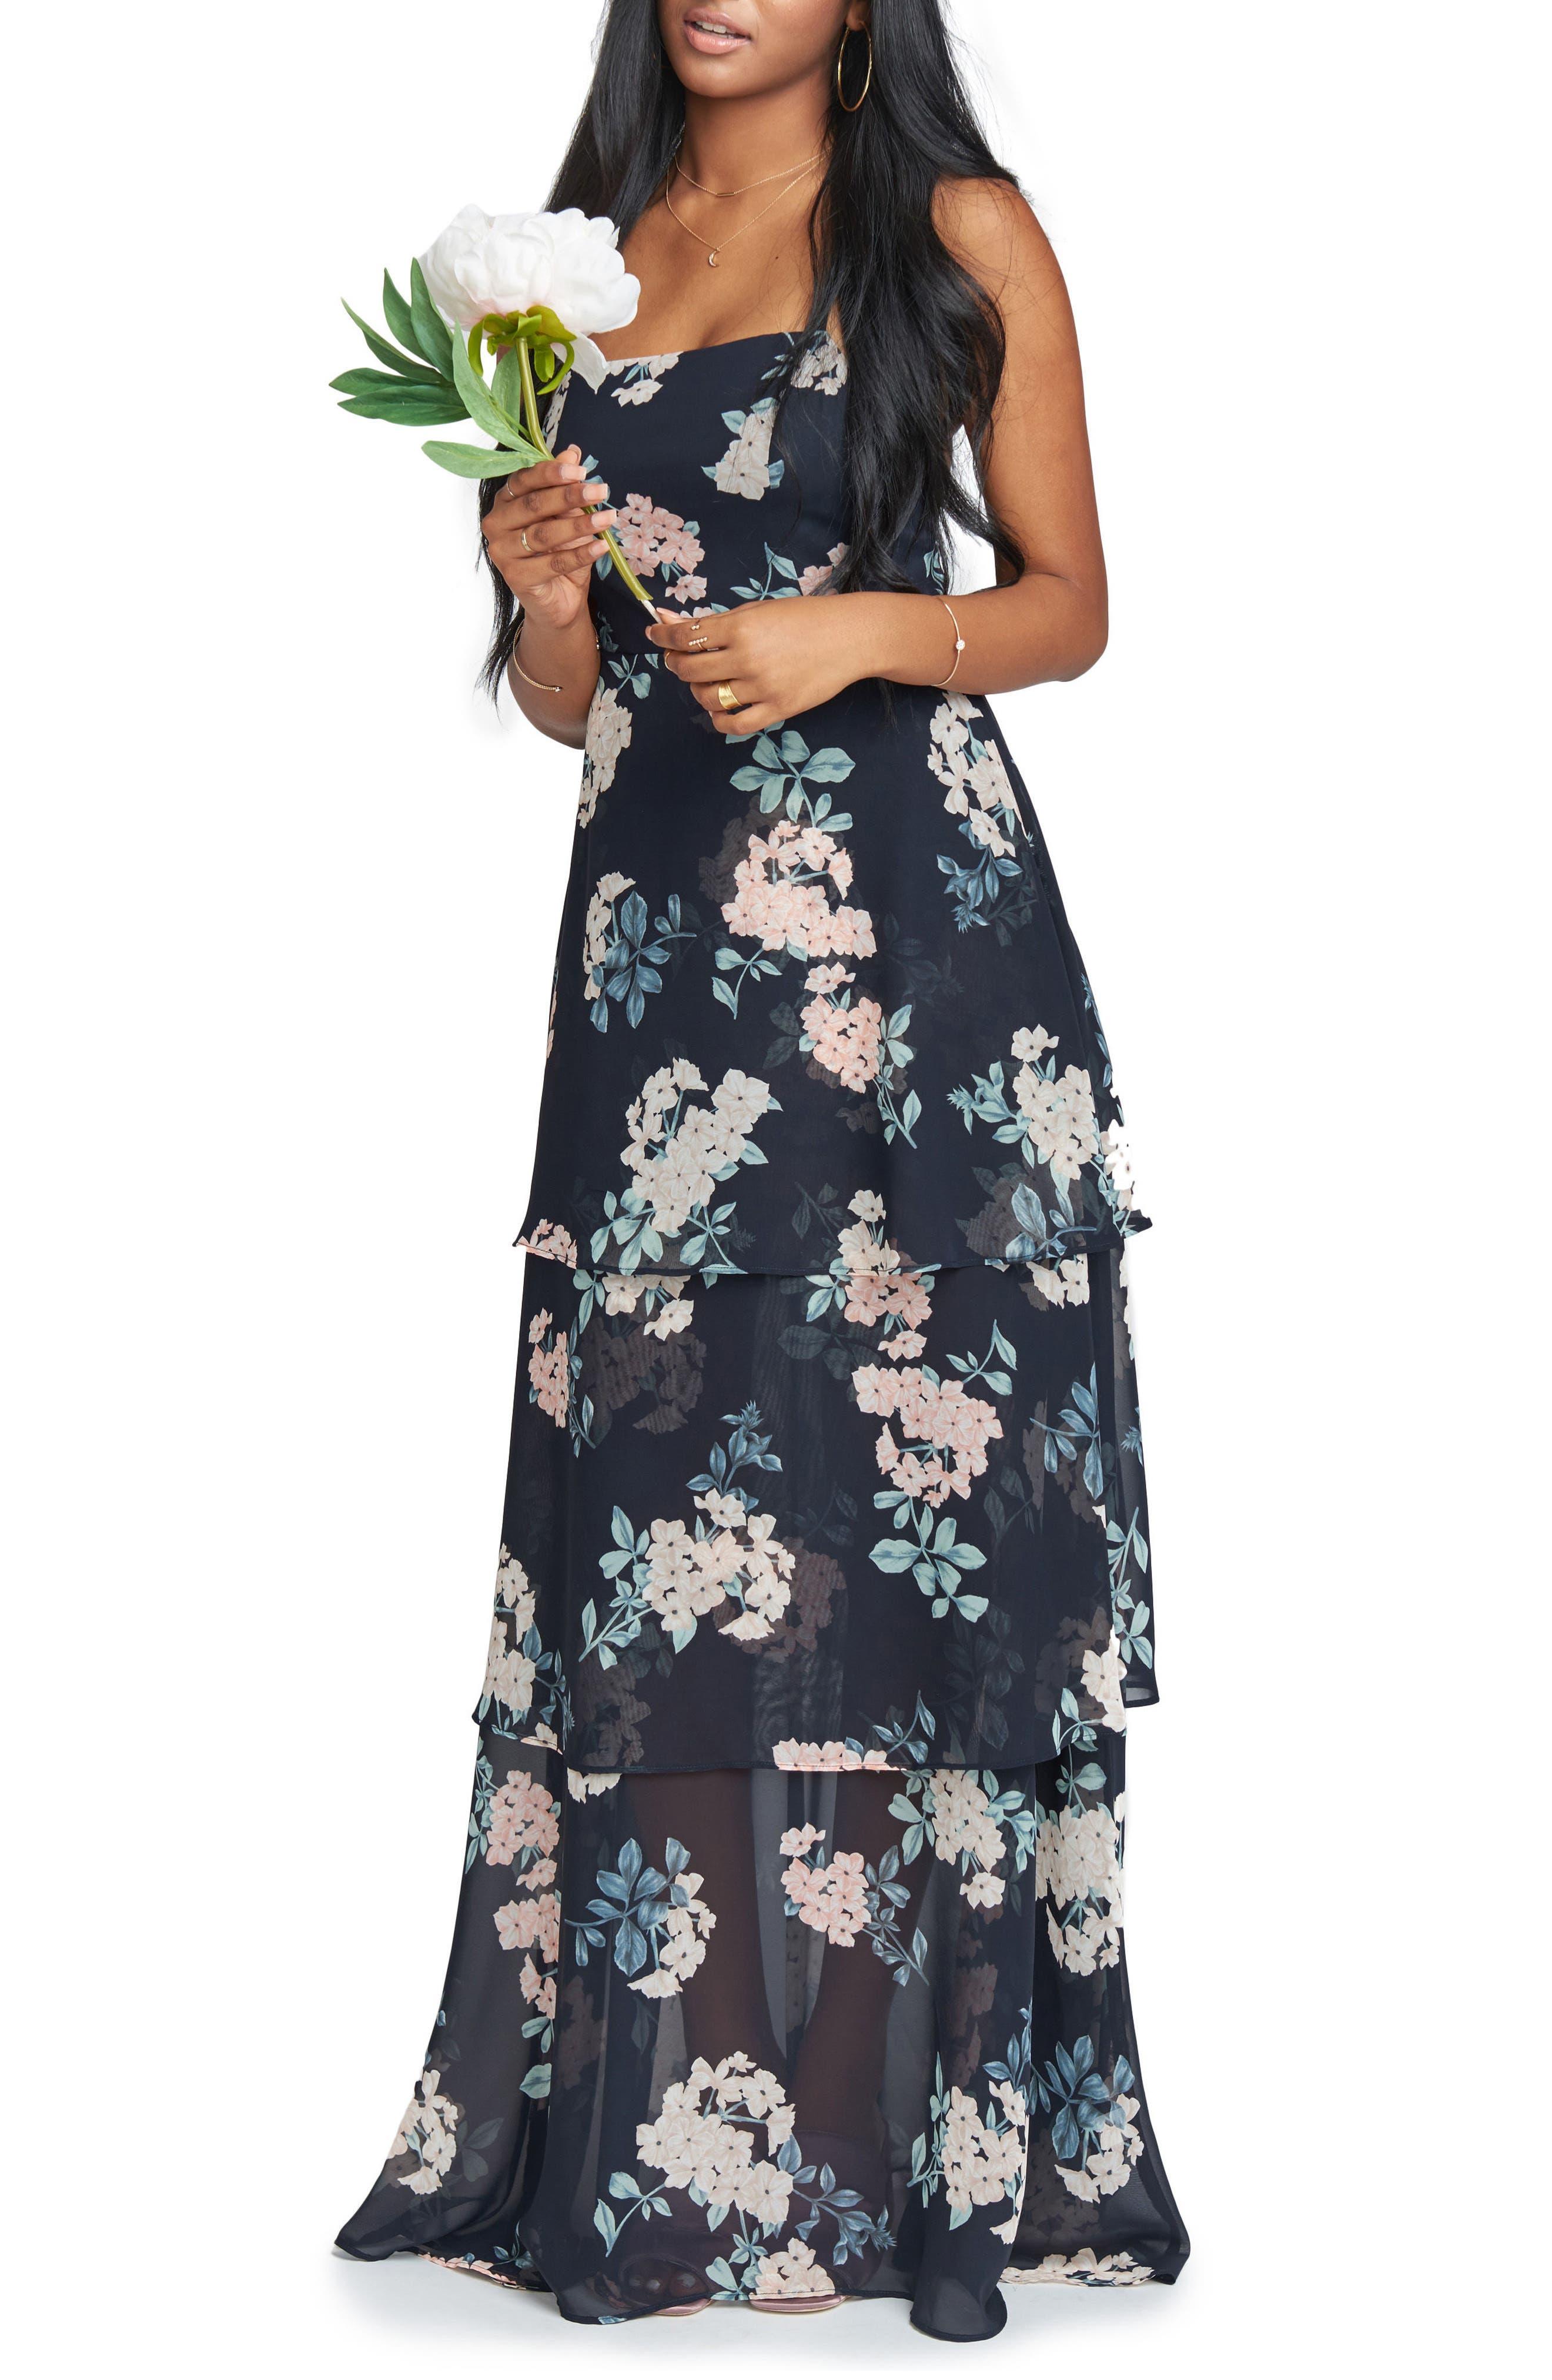 Calypso Strappy Tiered Maxi Dress,                         Main,                         color, 001